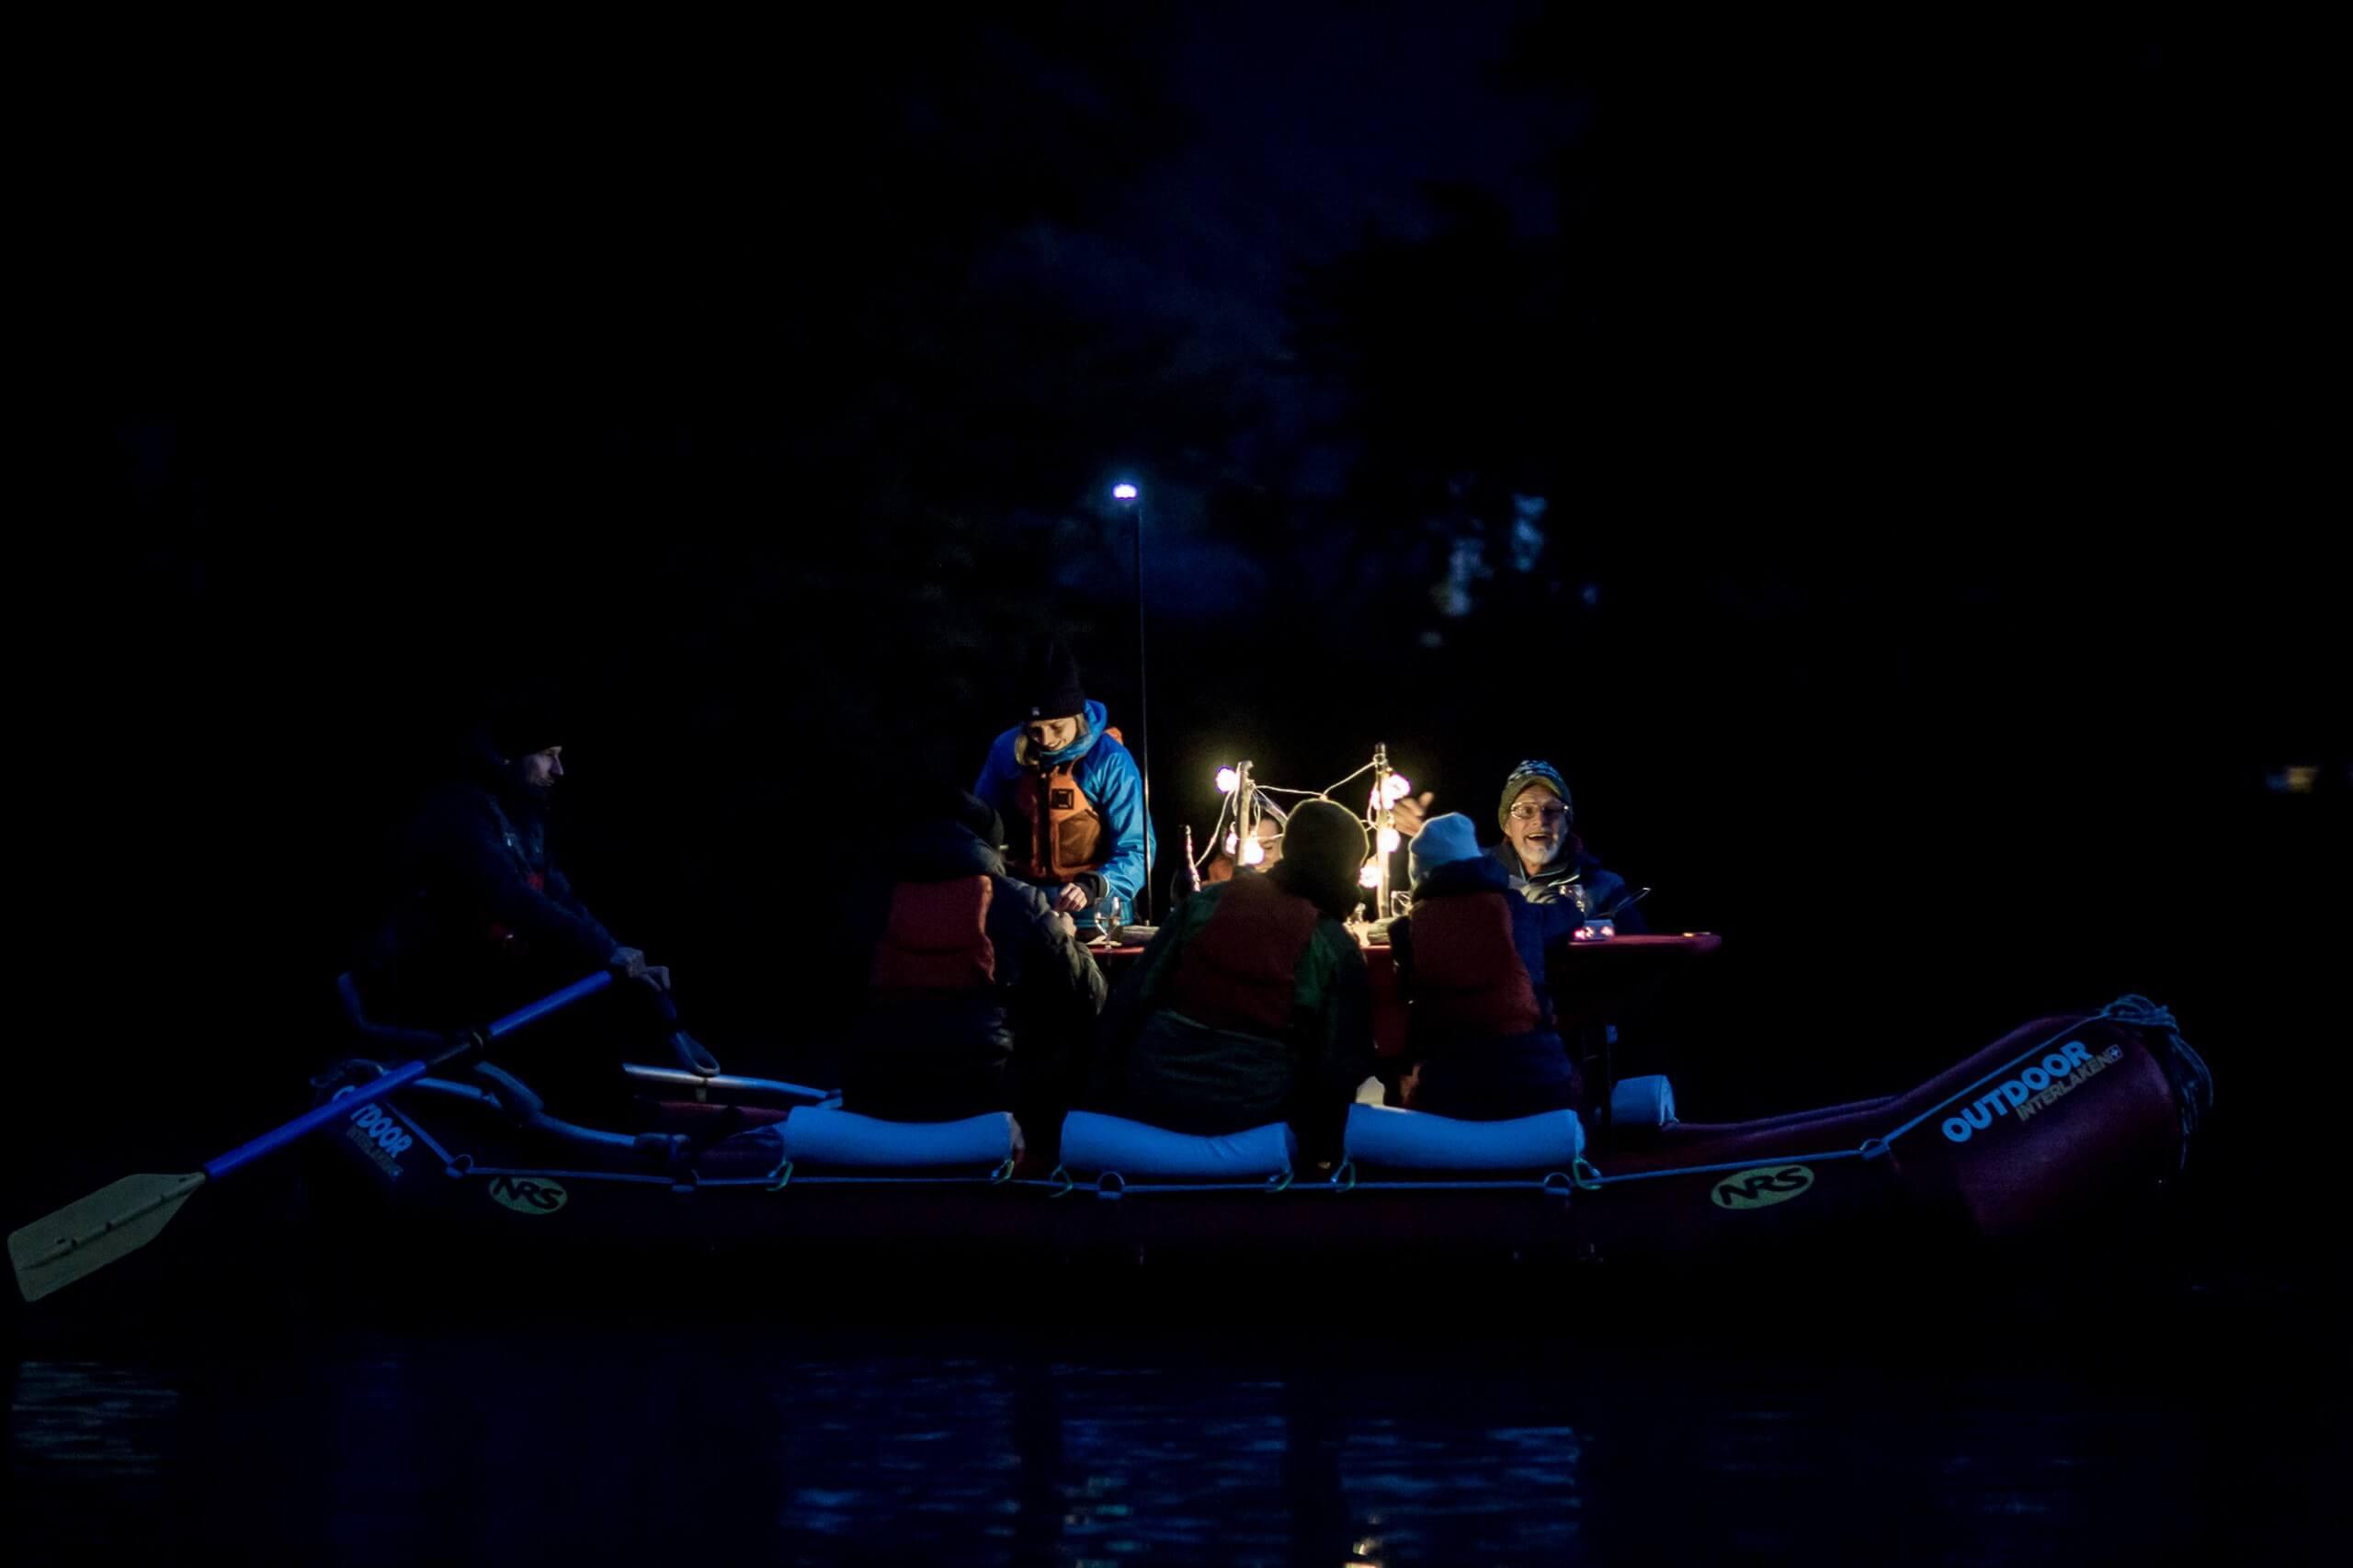 raclette-rafting-outdoor-interlaken-chillipictures-boot-nacht.jpg